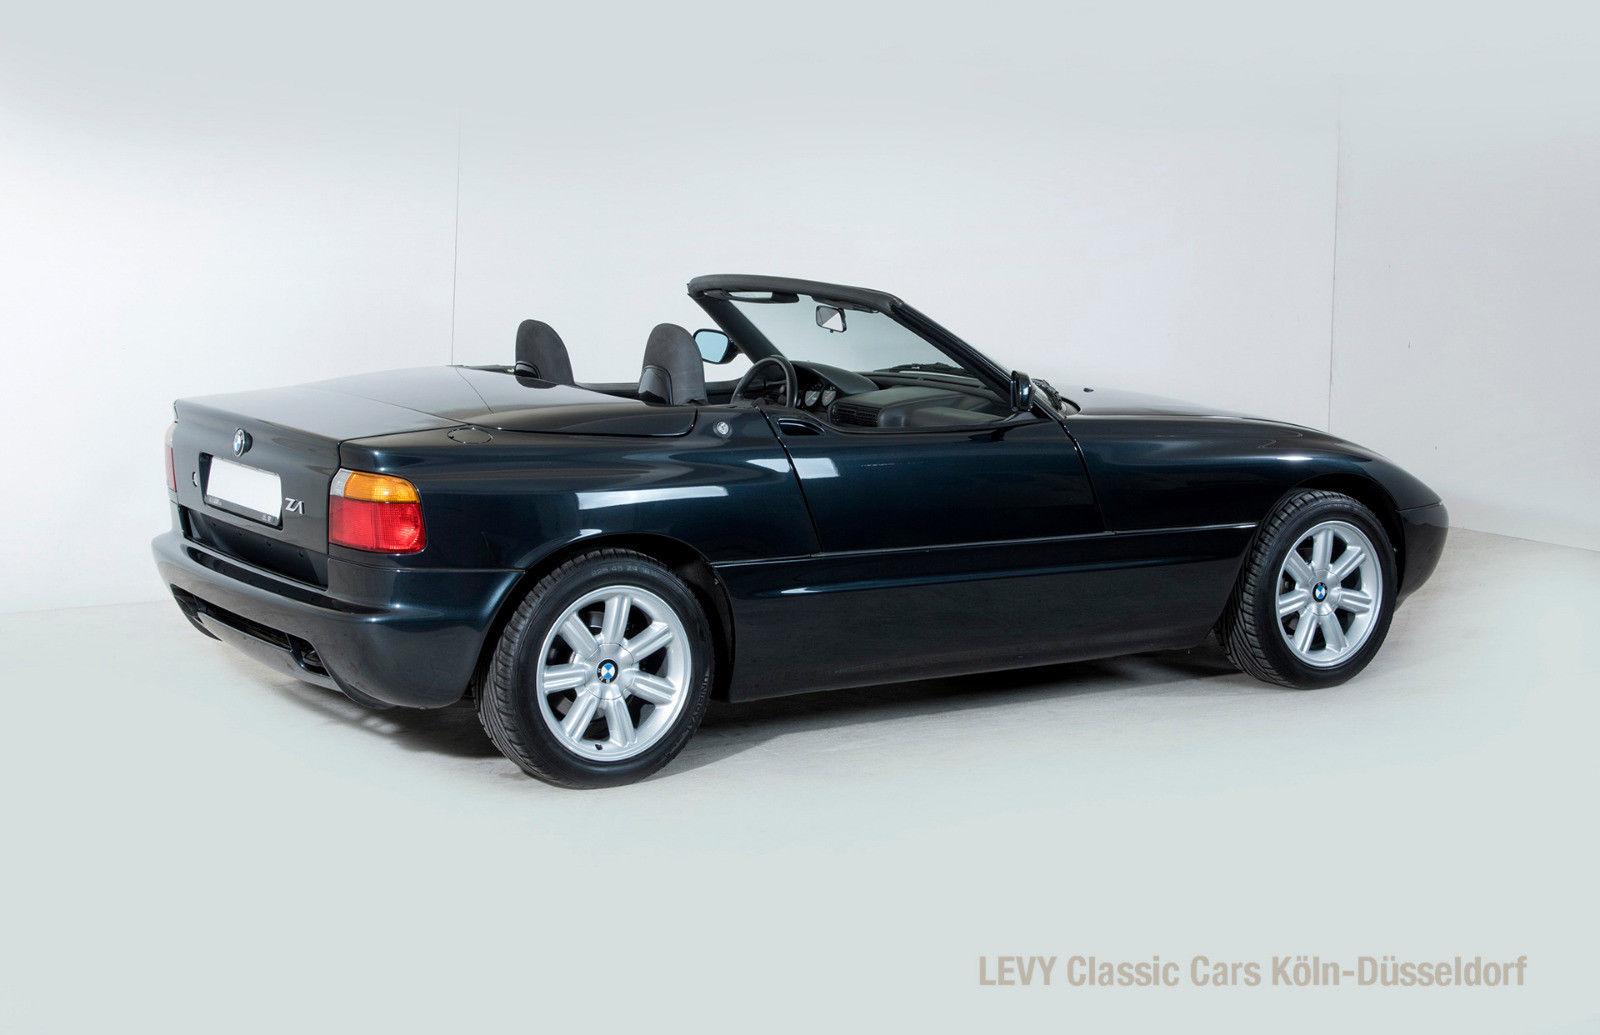 Cc03739 125 Levy Classic Cars